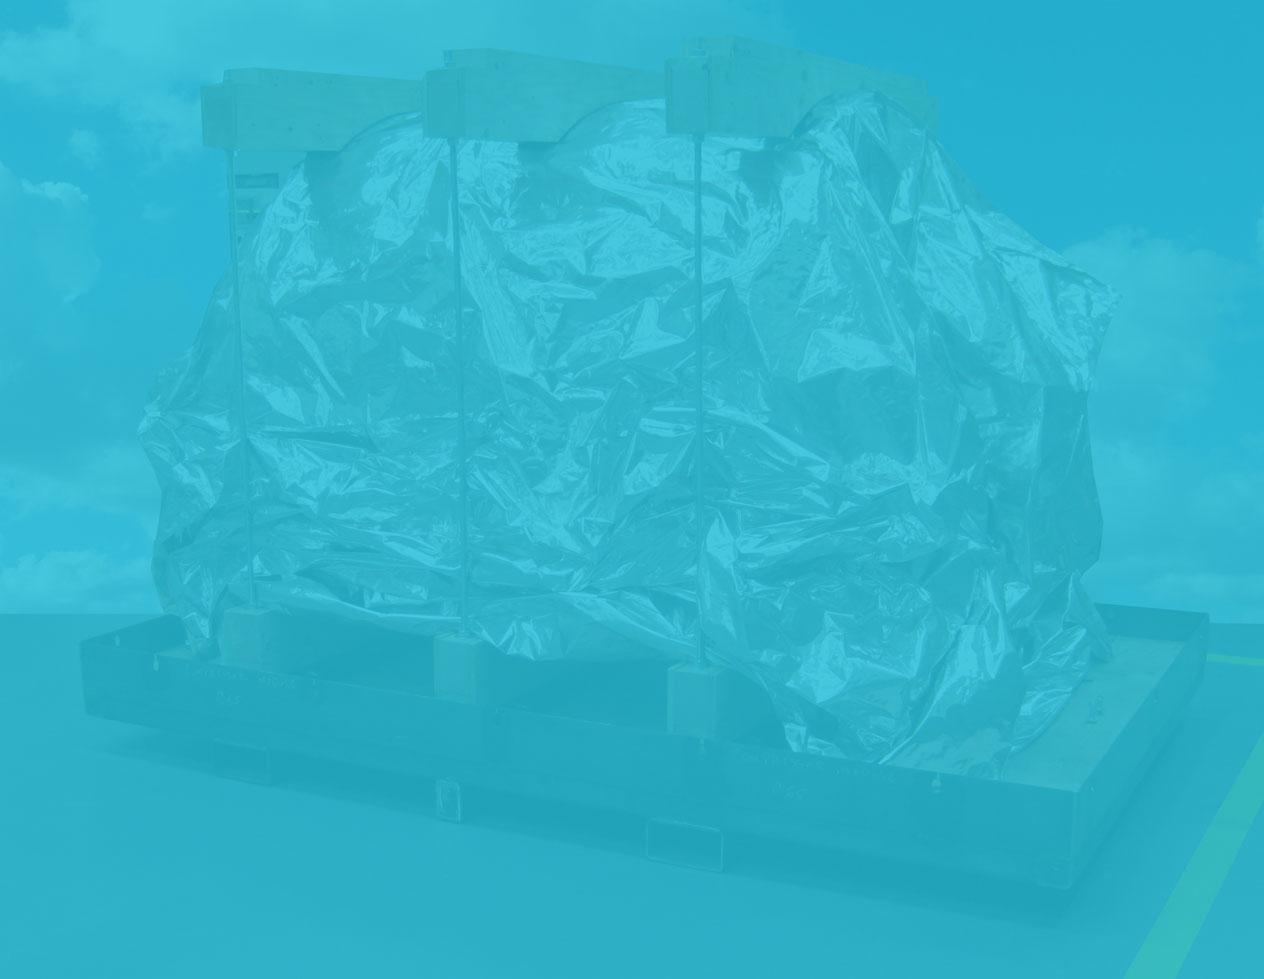 vapor barrier bag